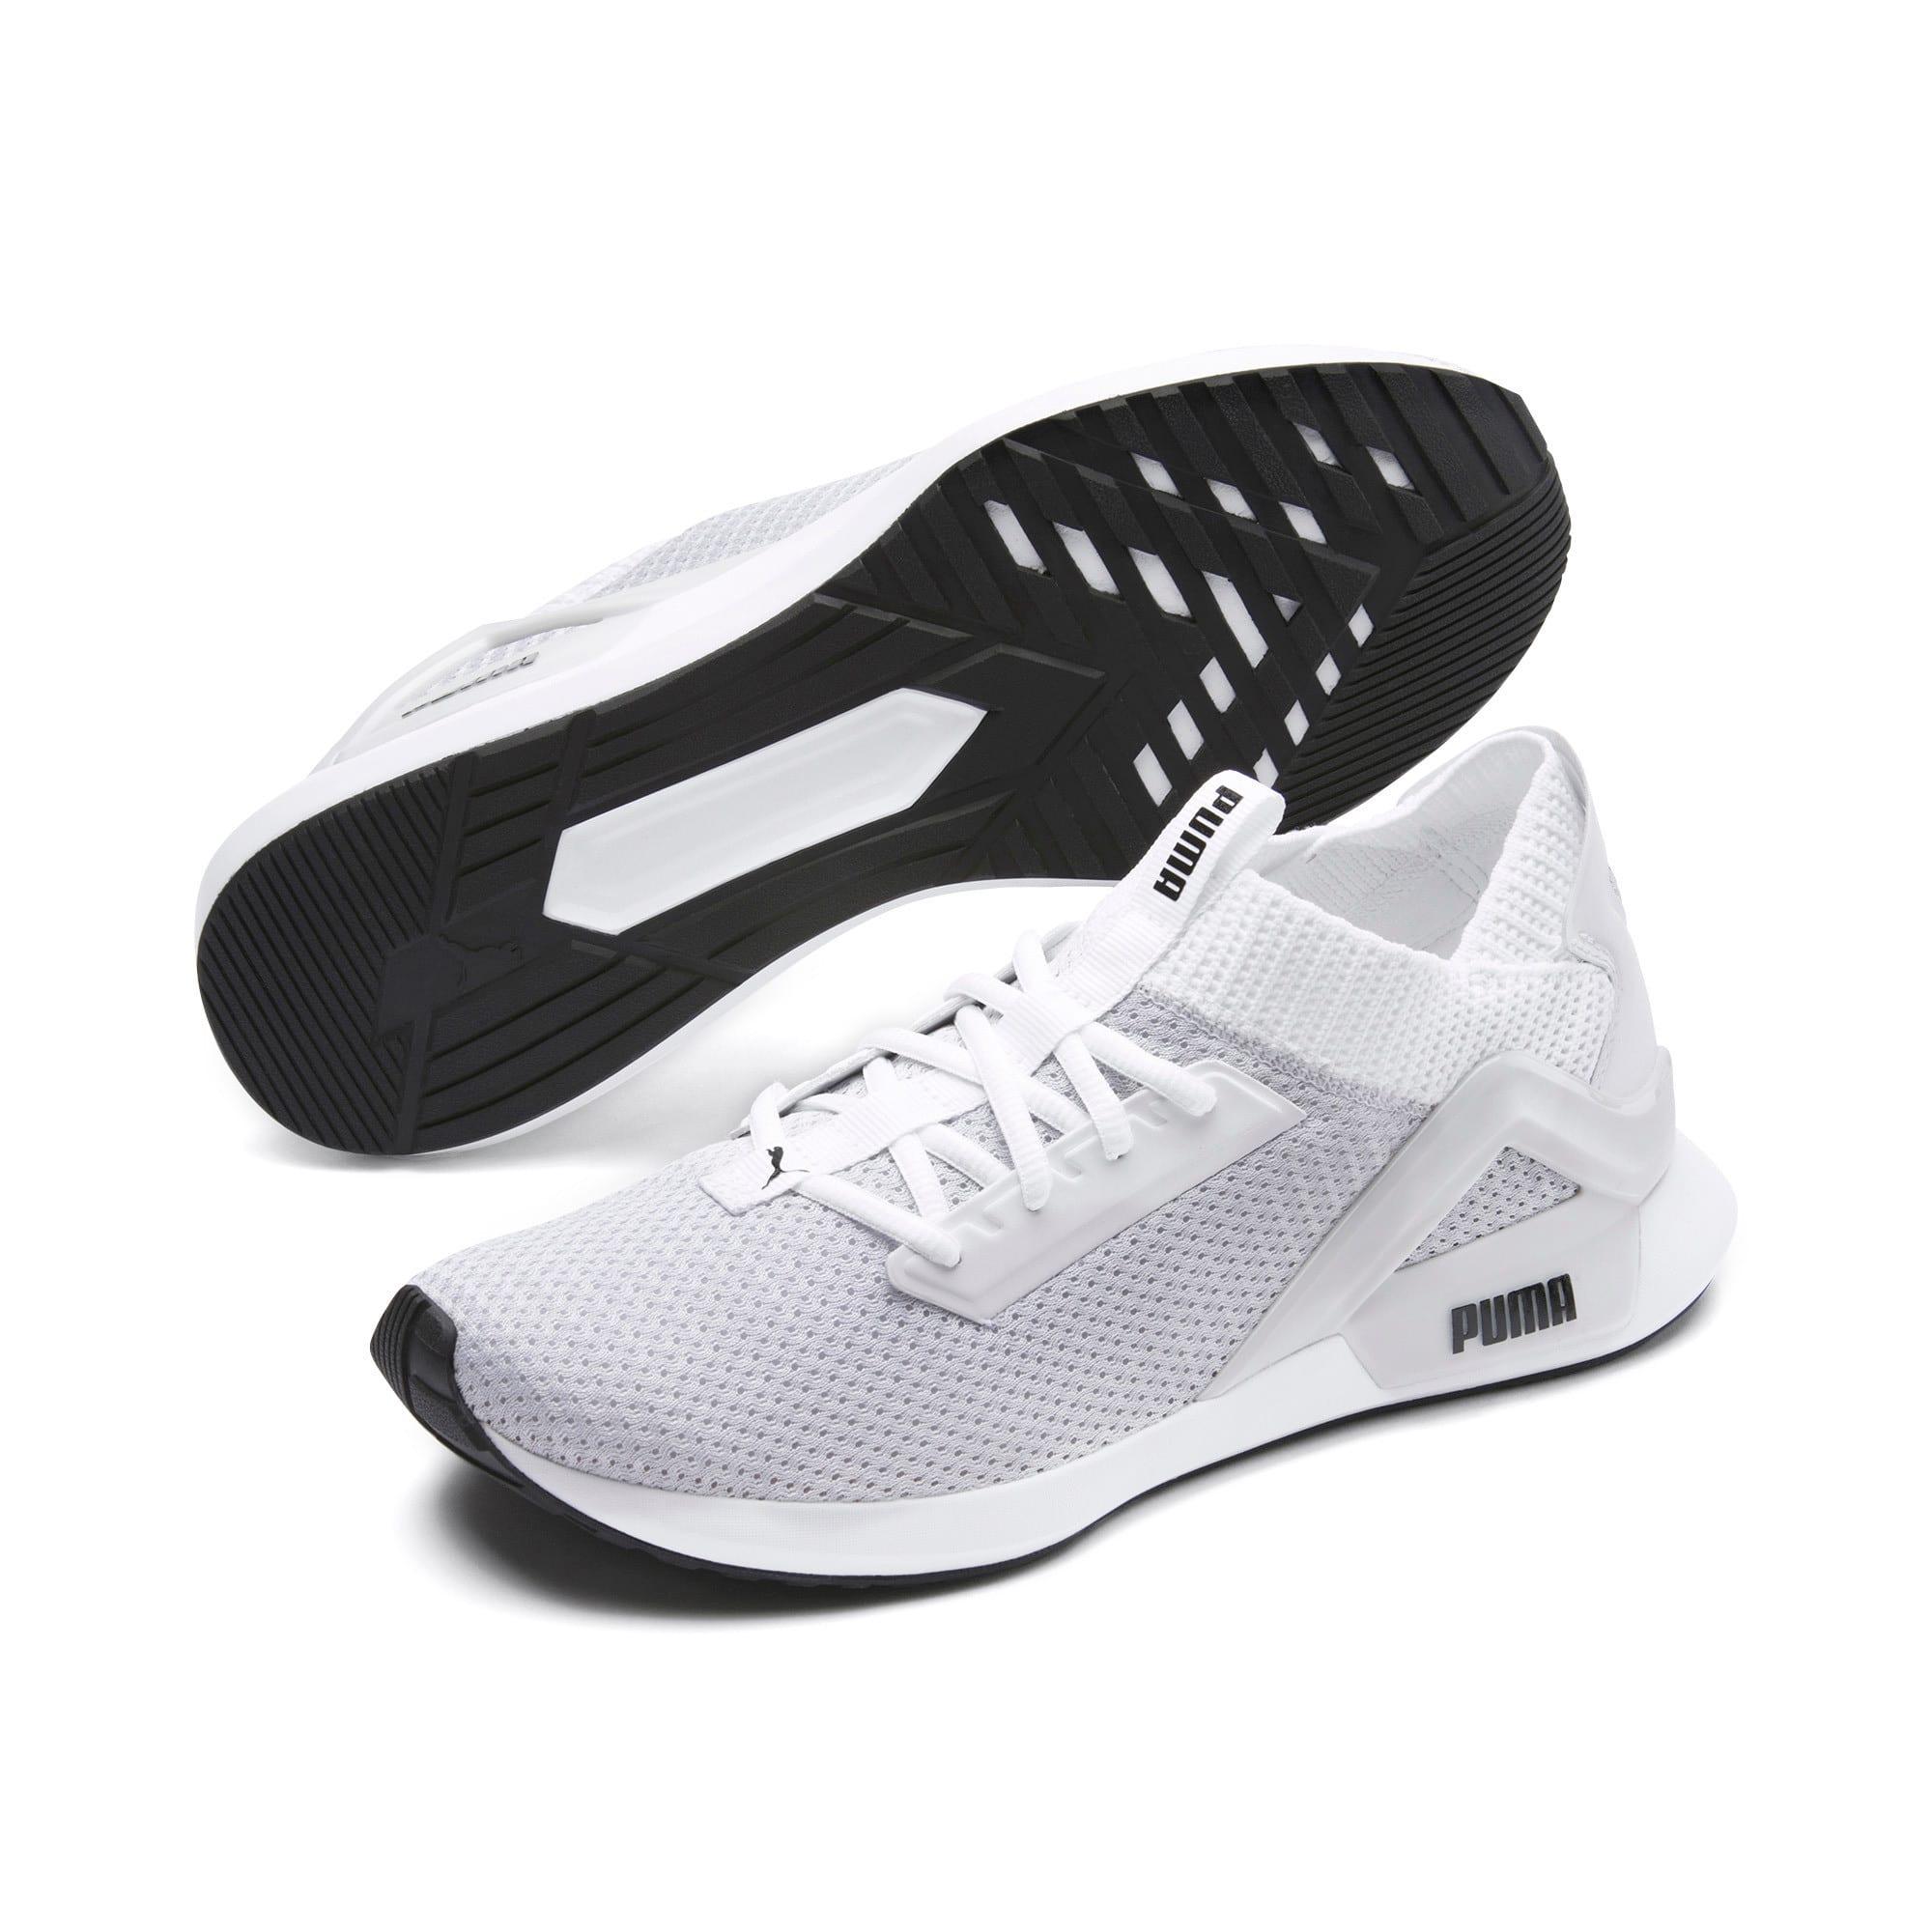 Thumbnail 2 of Rogue Men's Running Shoes, Puma White-Puma Black, medium